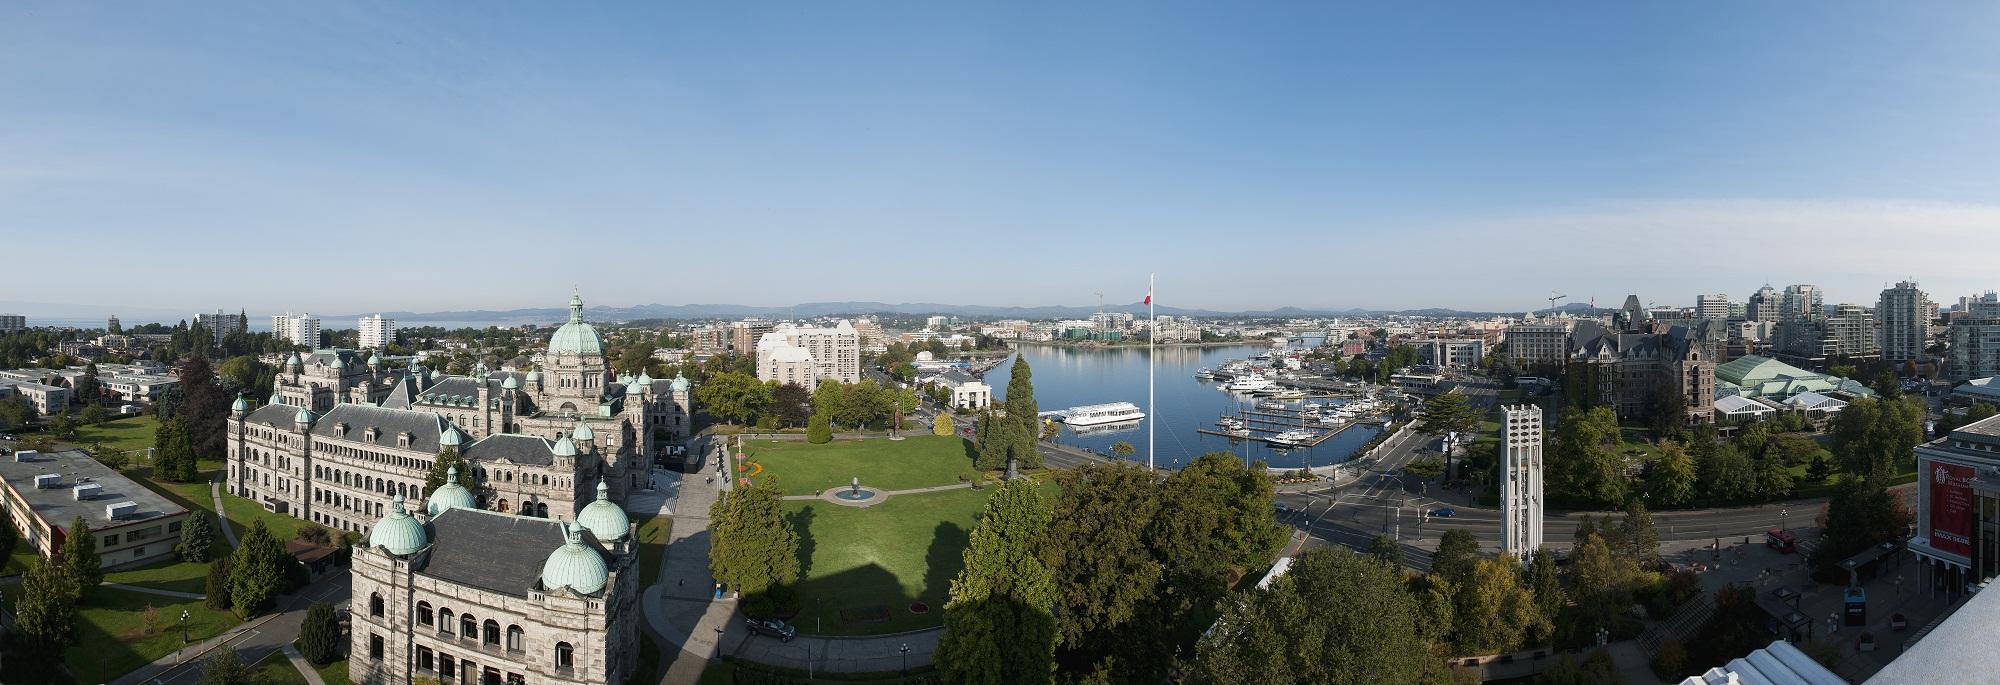 Victoria Inner Harbour Panorama